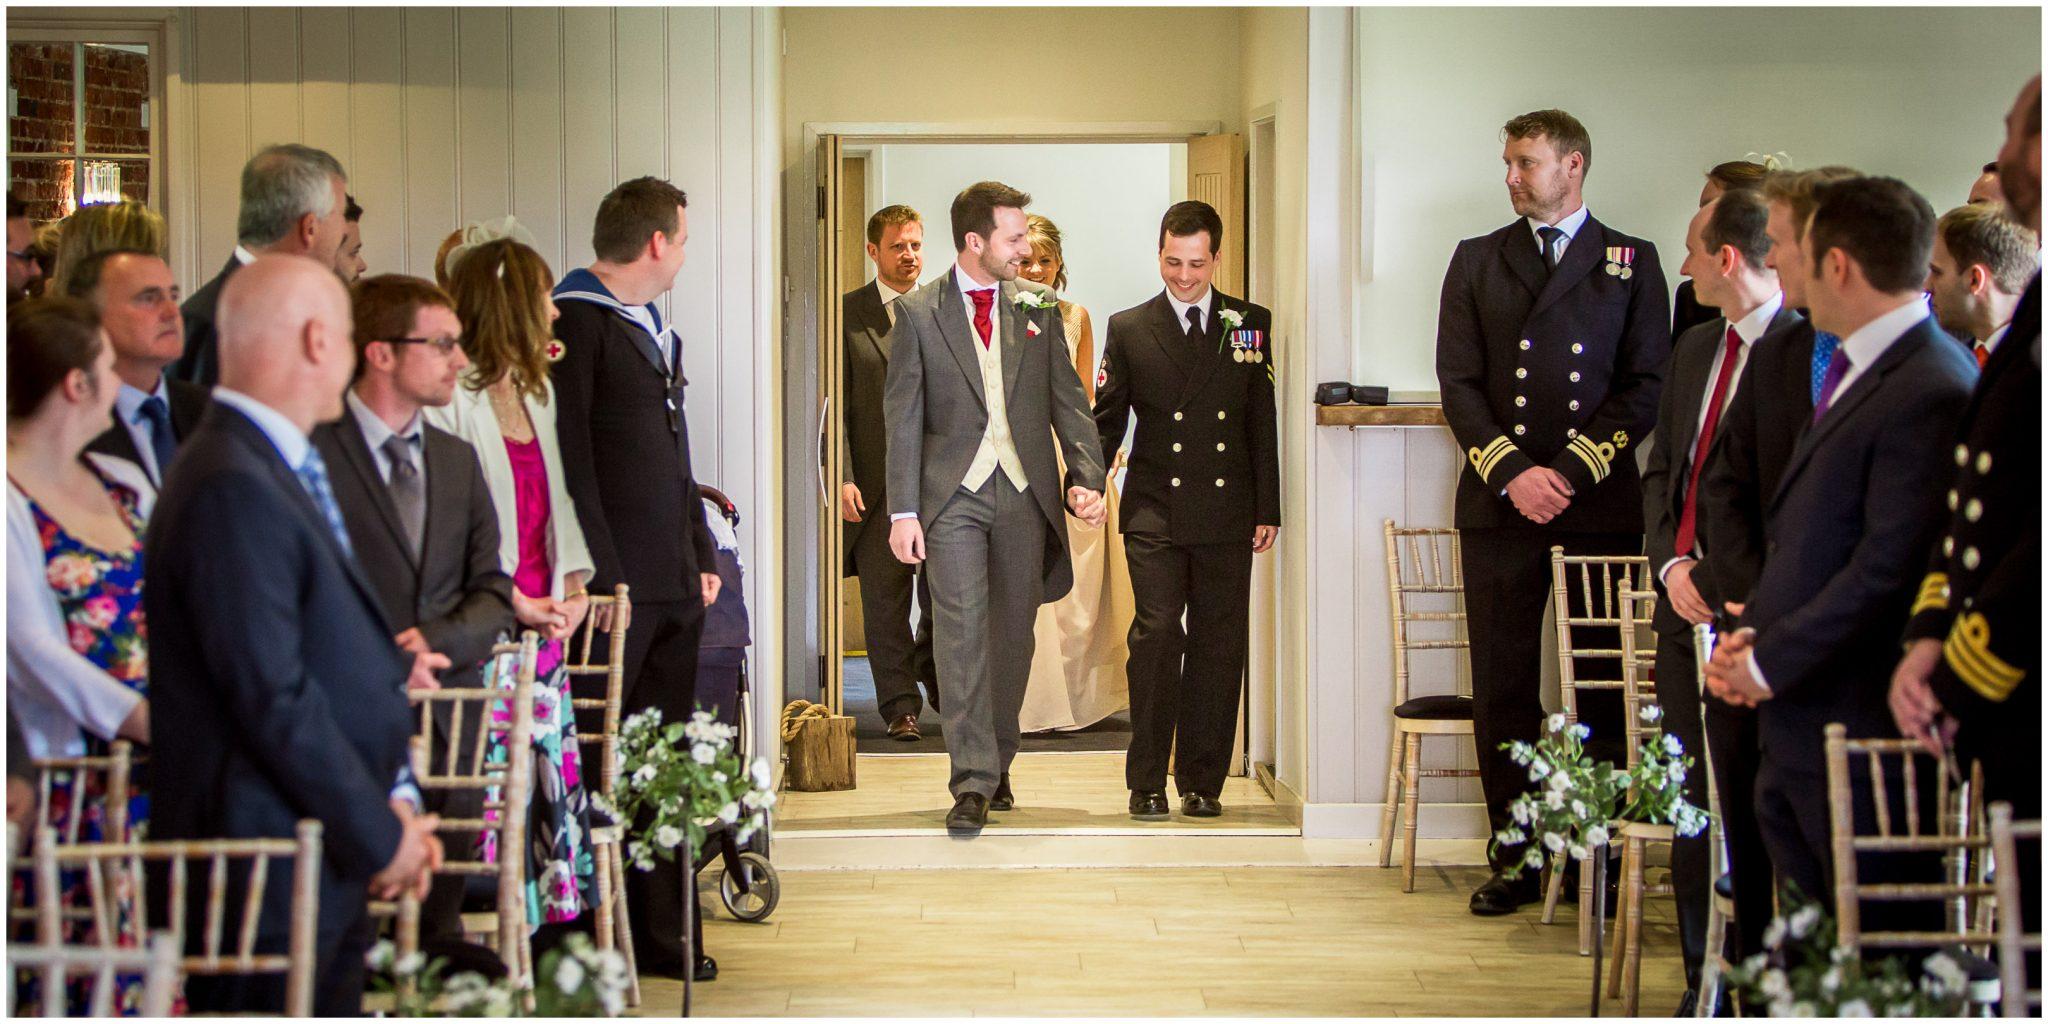 Sopley wedding photographer grooms walk down aisle